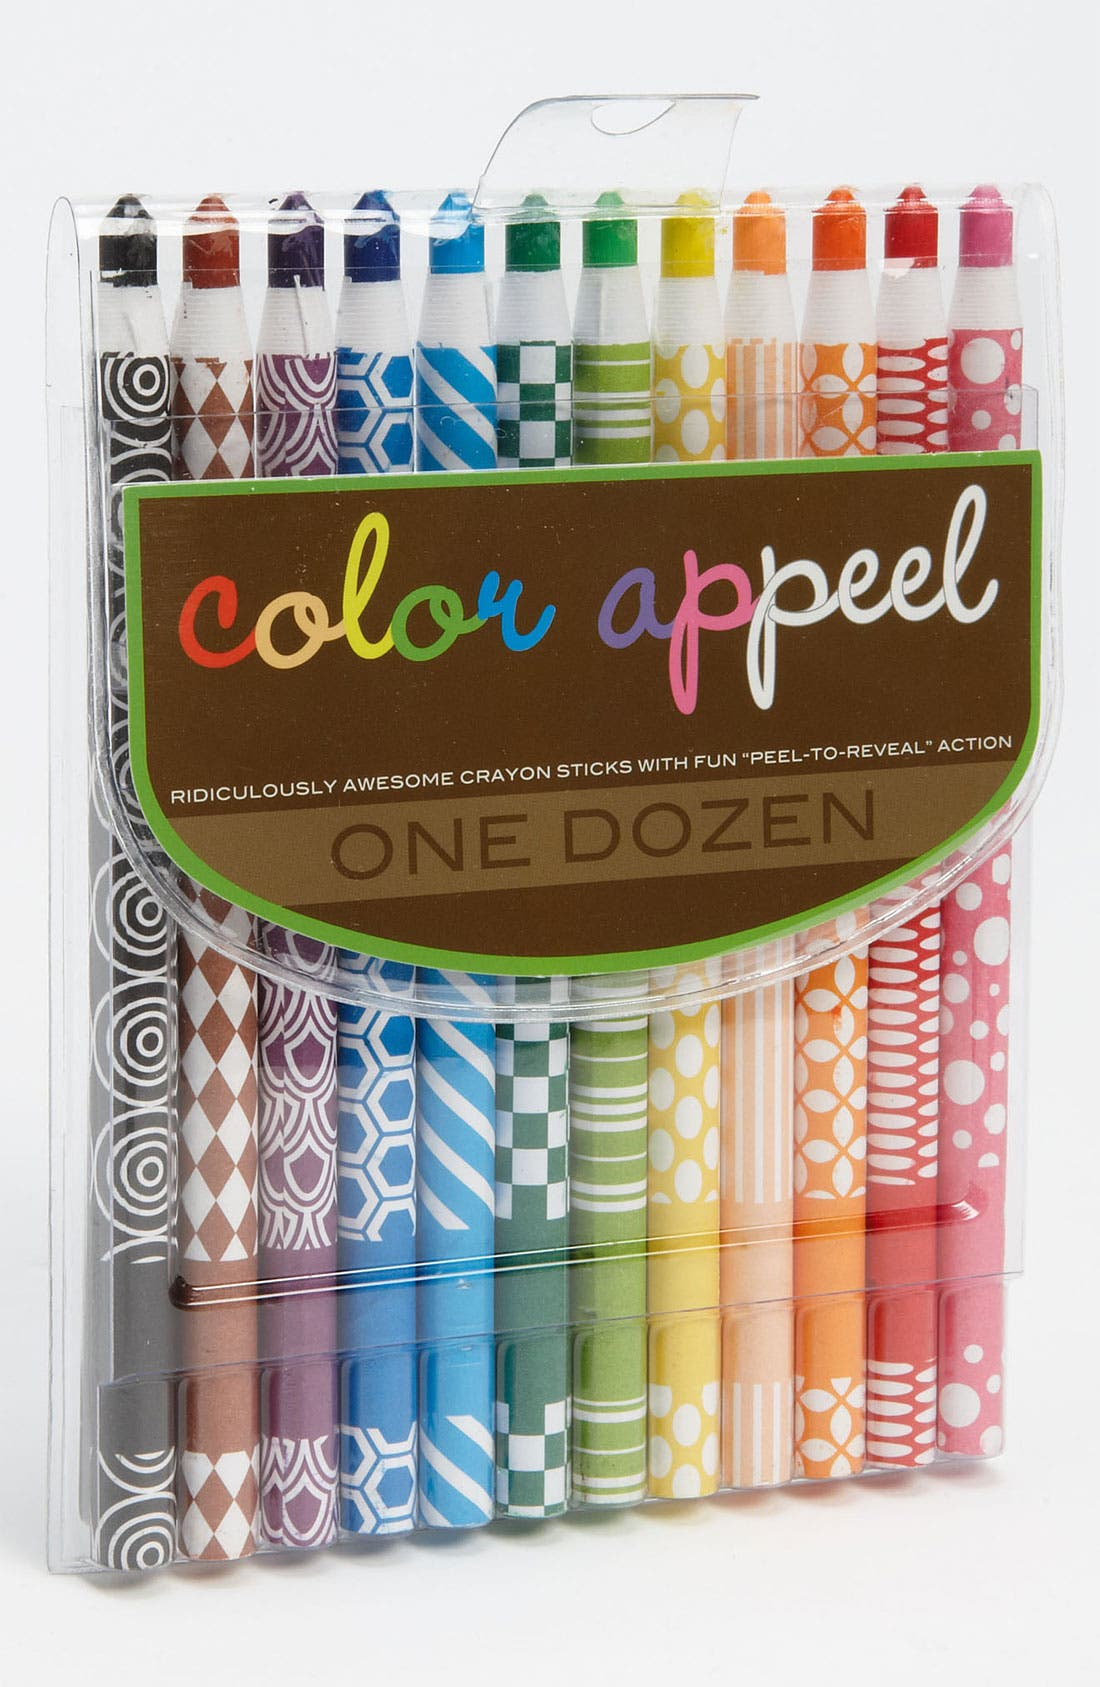 Alternate Image 1 Selected - International Arrivals 'Color Appeel' Crayon Sticks